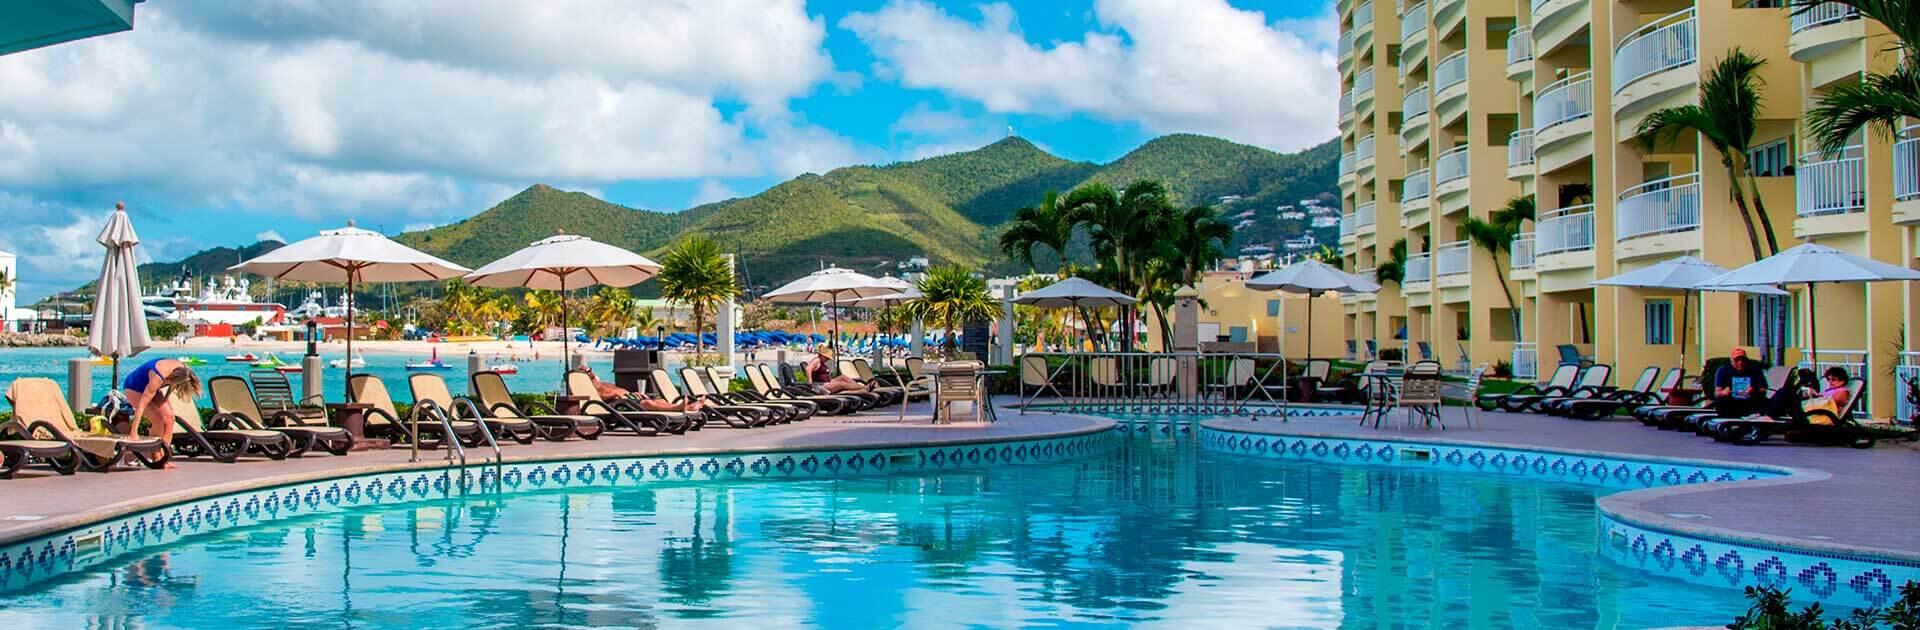 The Villas at Simpson Bay Beach Resort & Marina